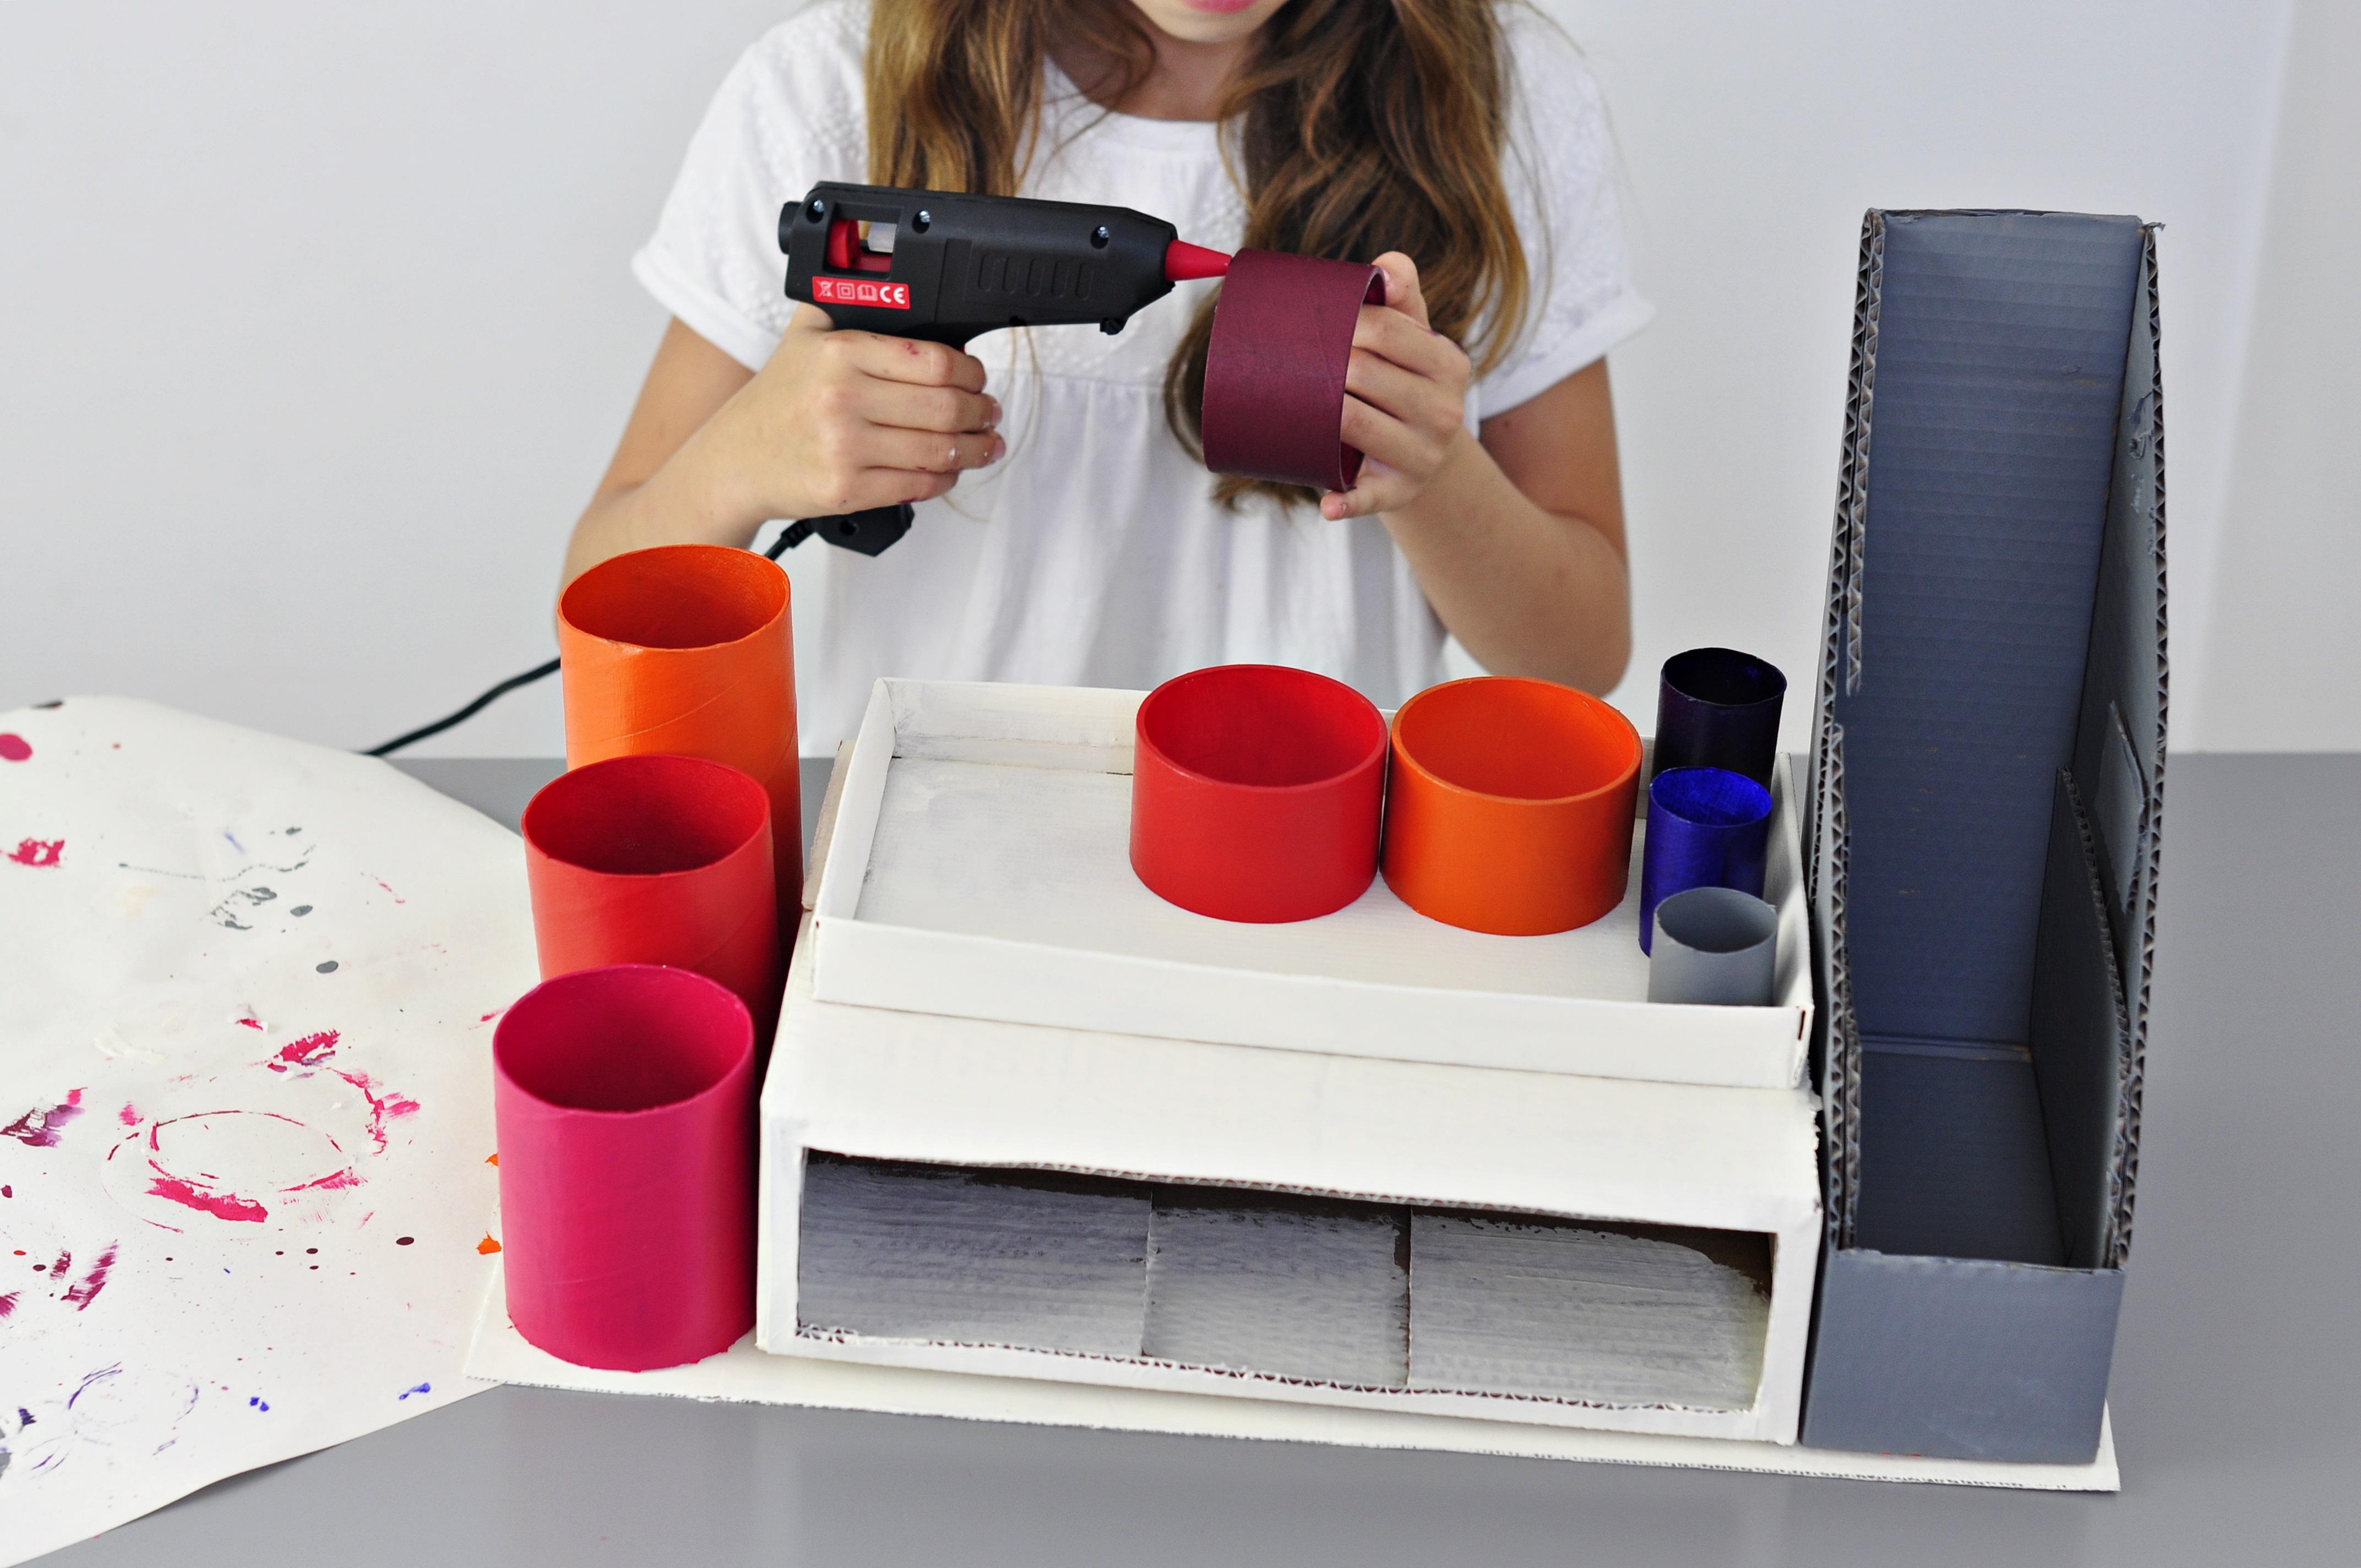 jak samemu zrobić organizer na biurko